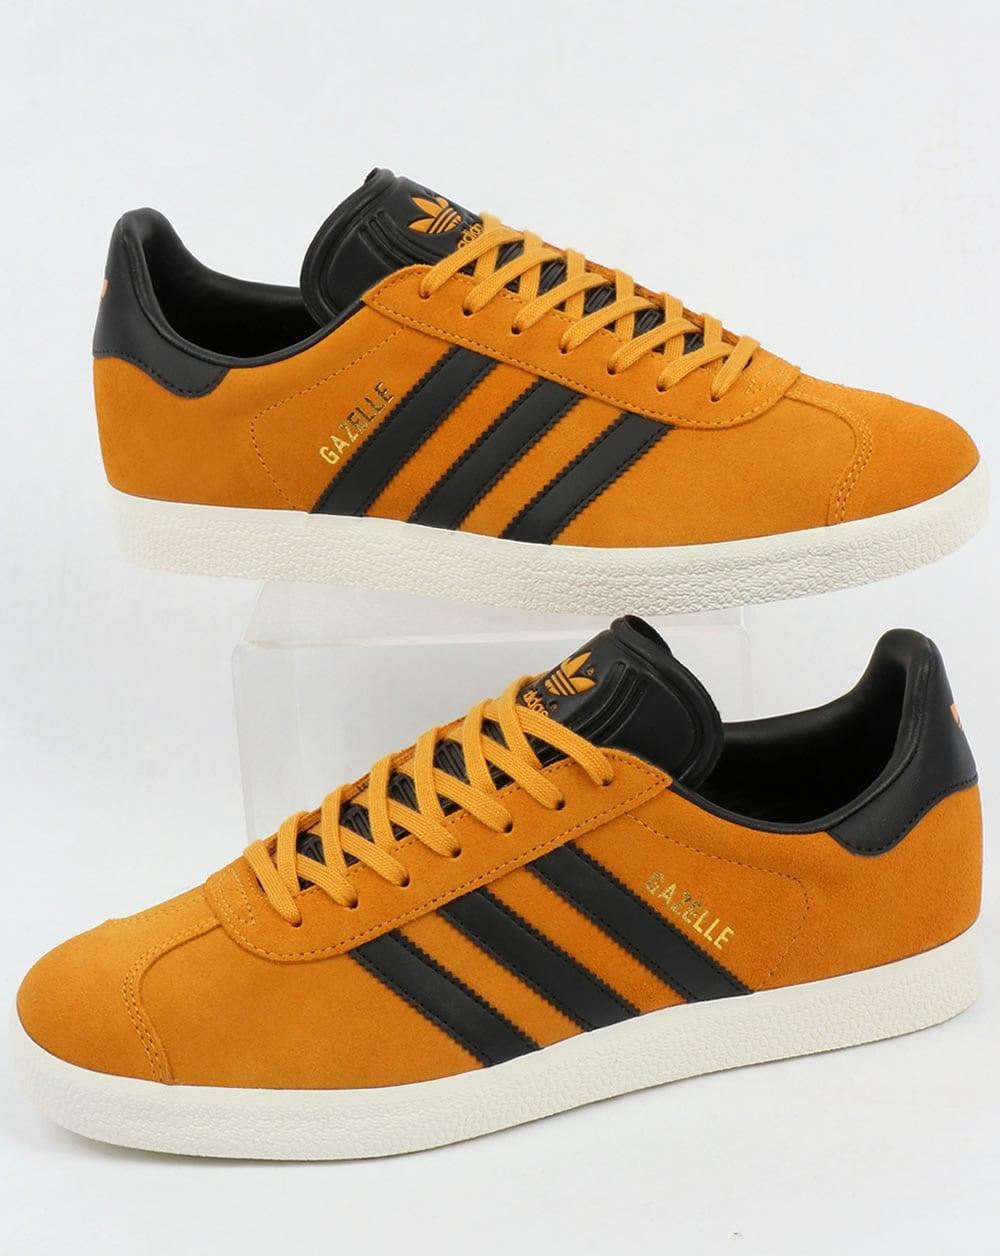 Adidas Gazelle Trainers, Jamaica,Yellow